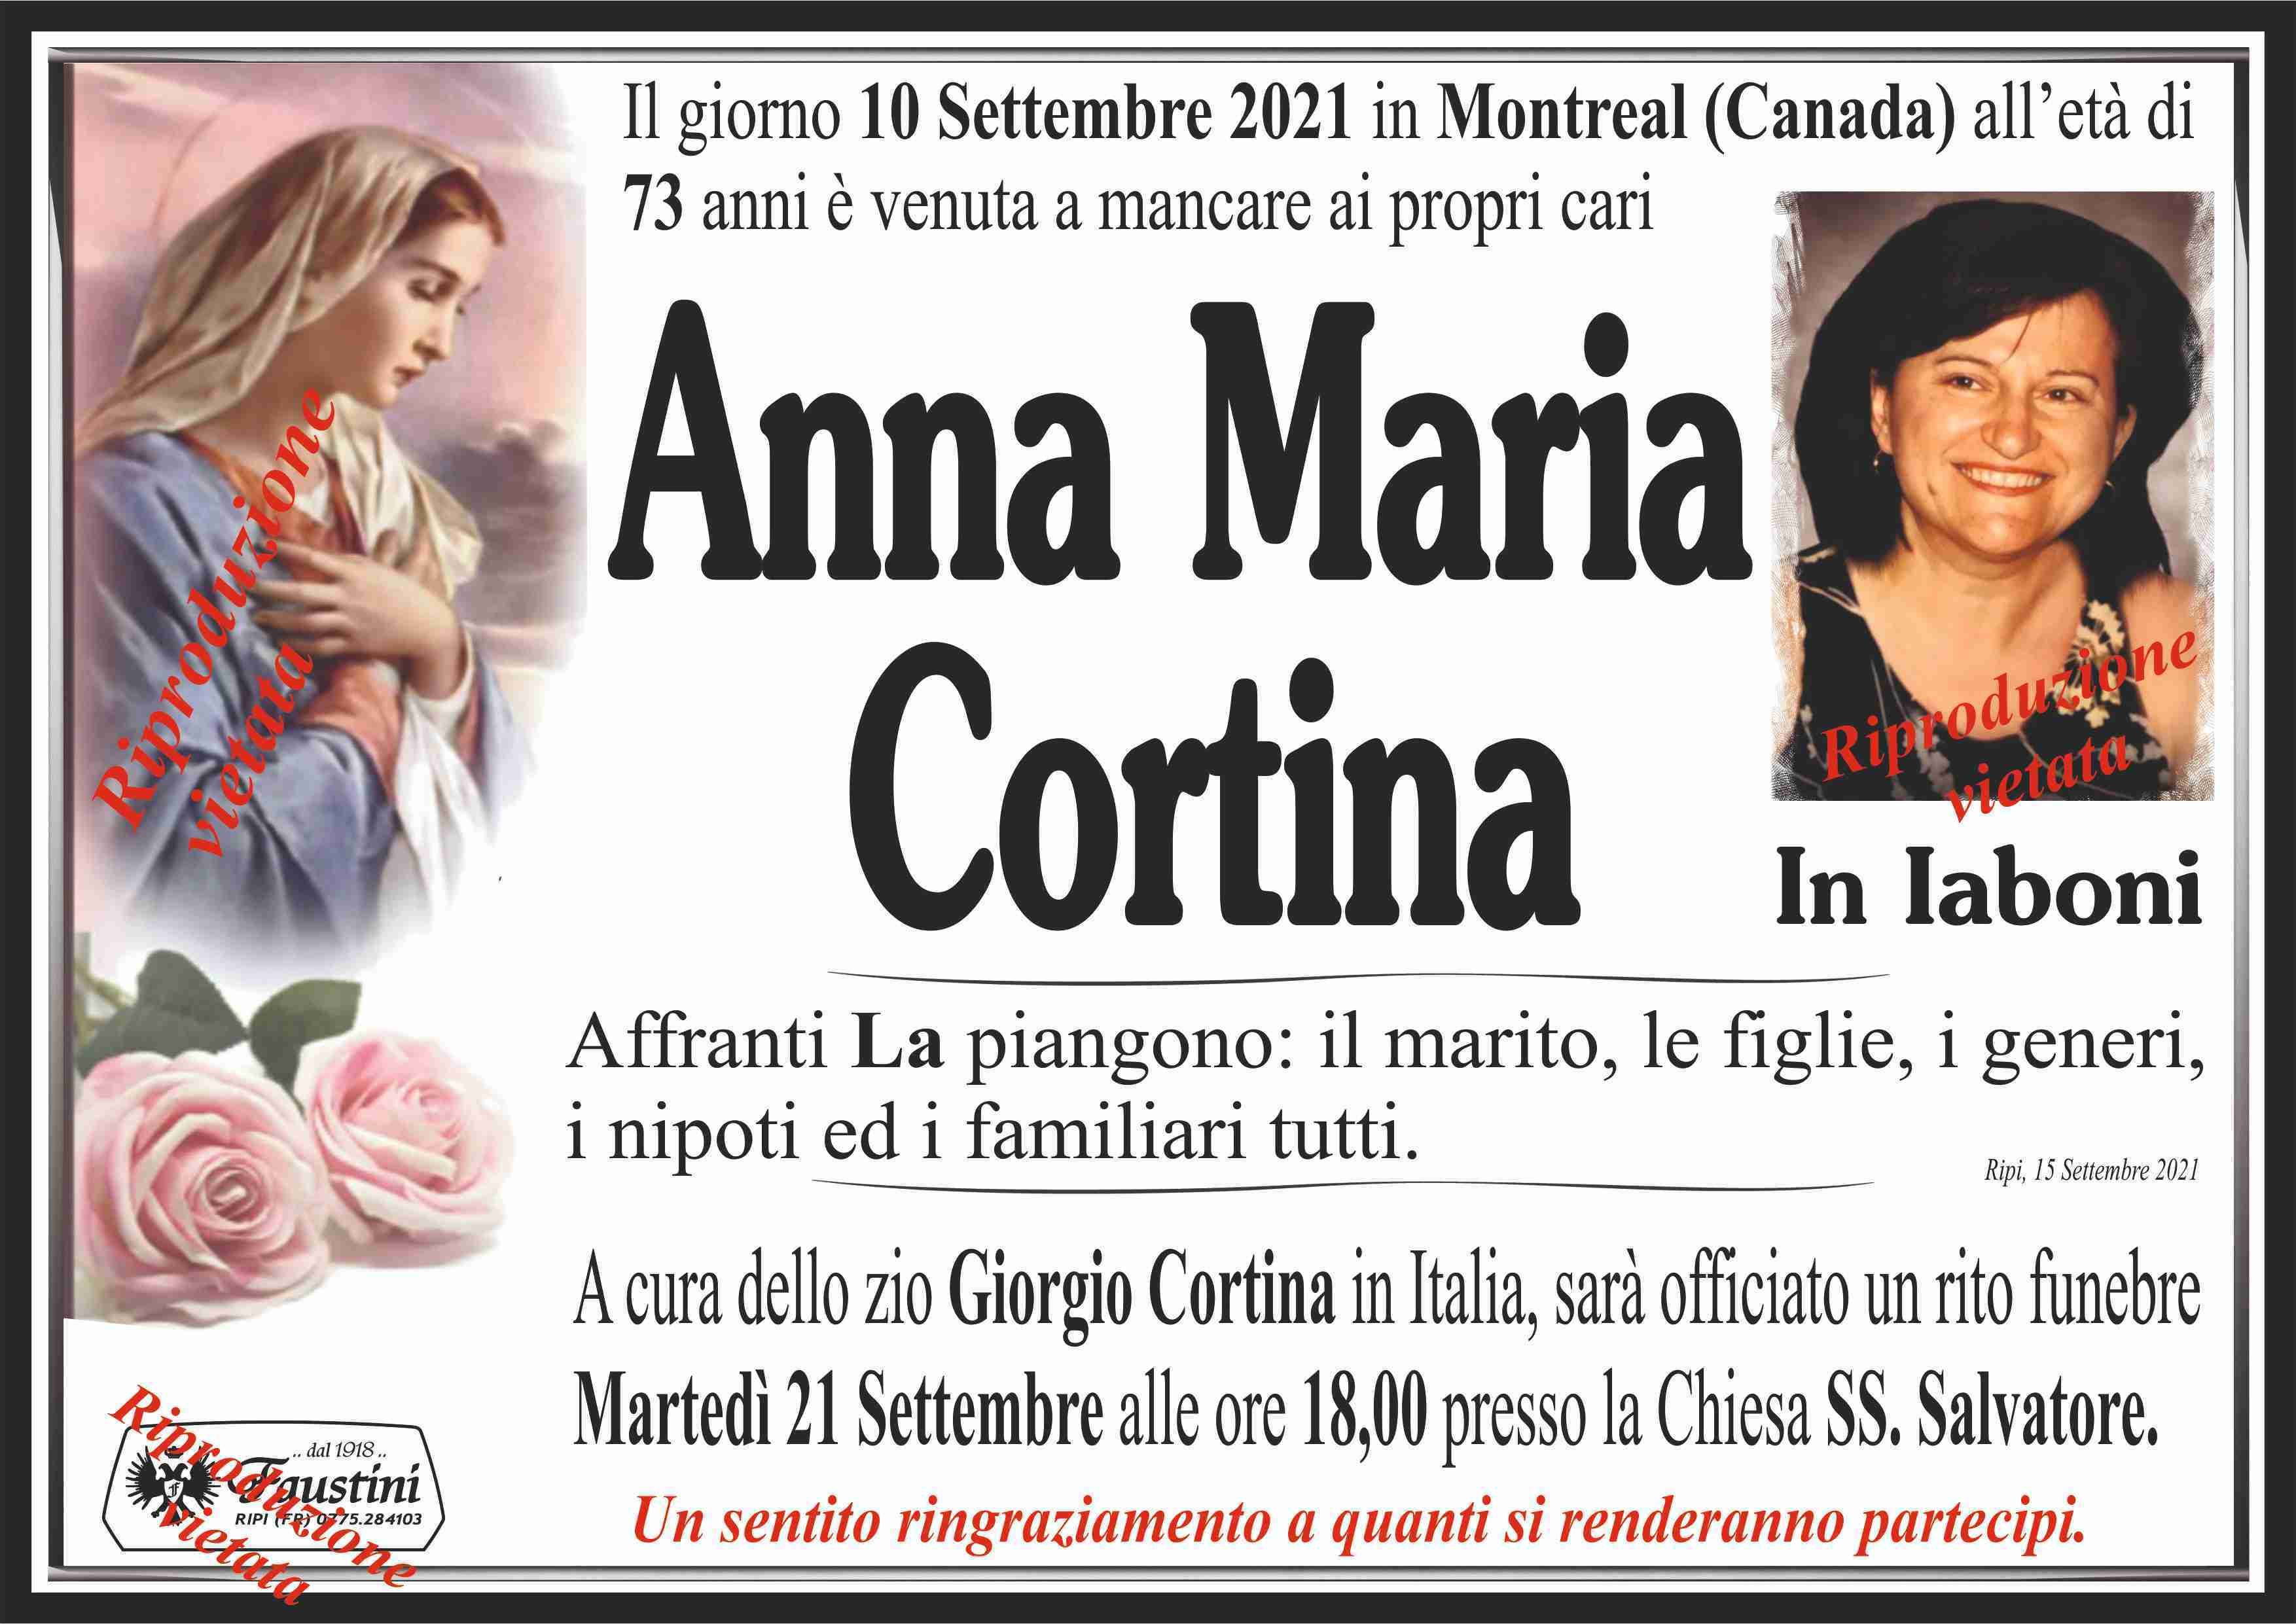 Anna Maria Cortina